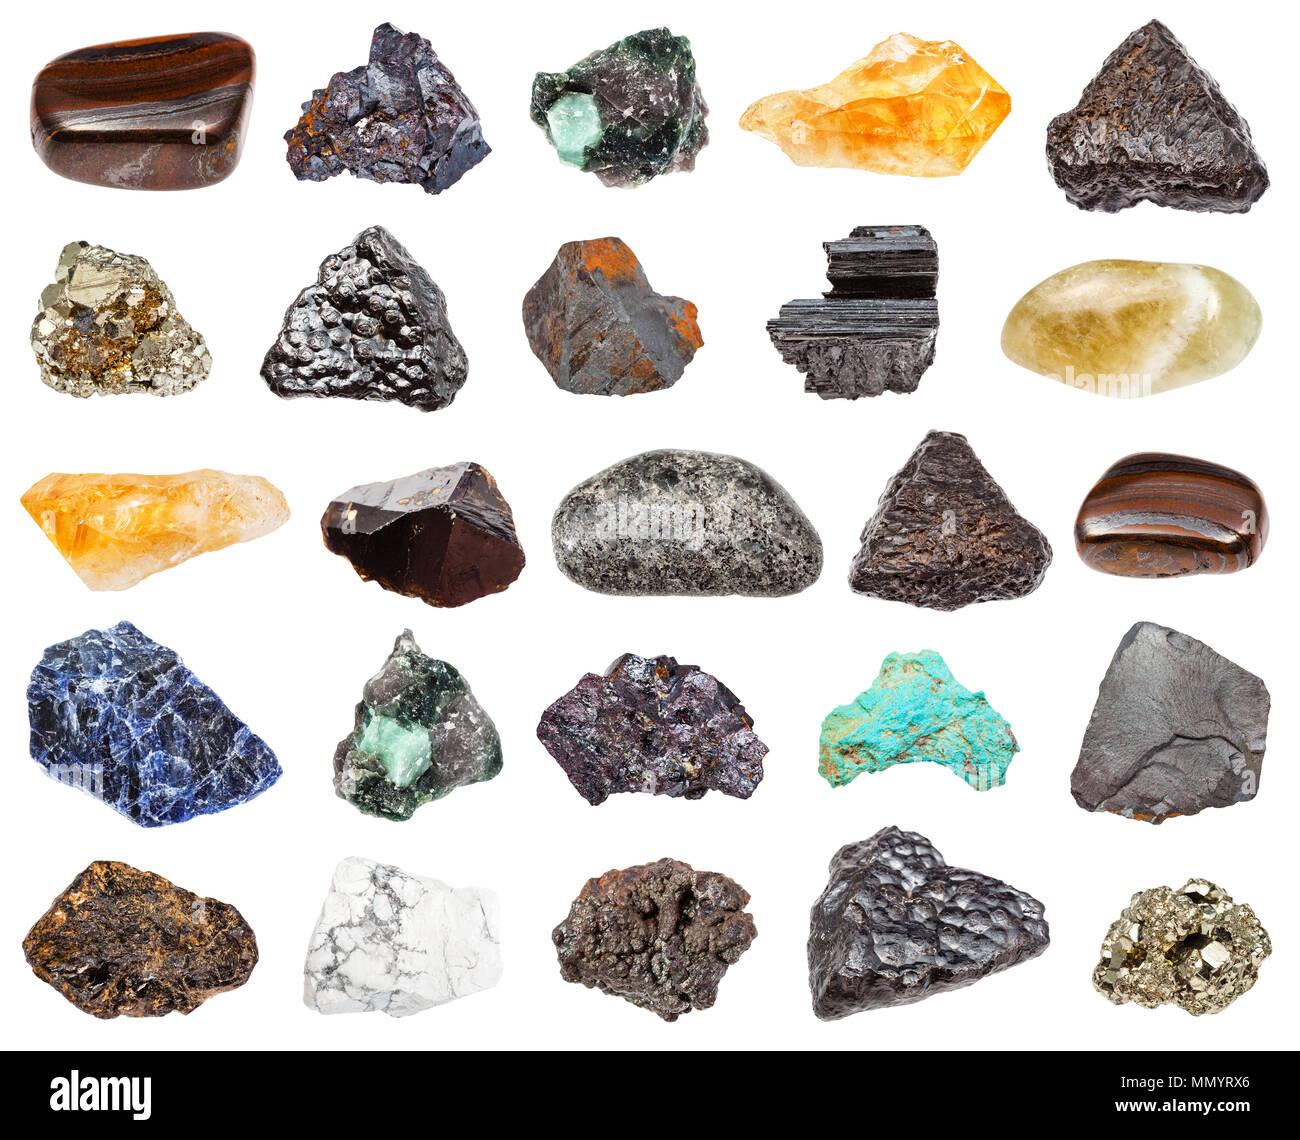 set of various minerals isolated on white background : cassiterite, peridotite, jaspillite, prasiolite, turquoise, cuprite, beryl, howlite, citrine, g - Stock Image